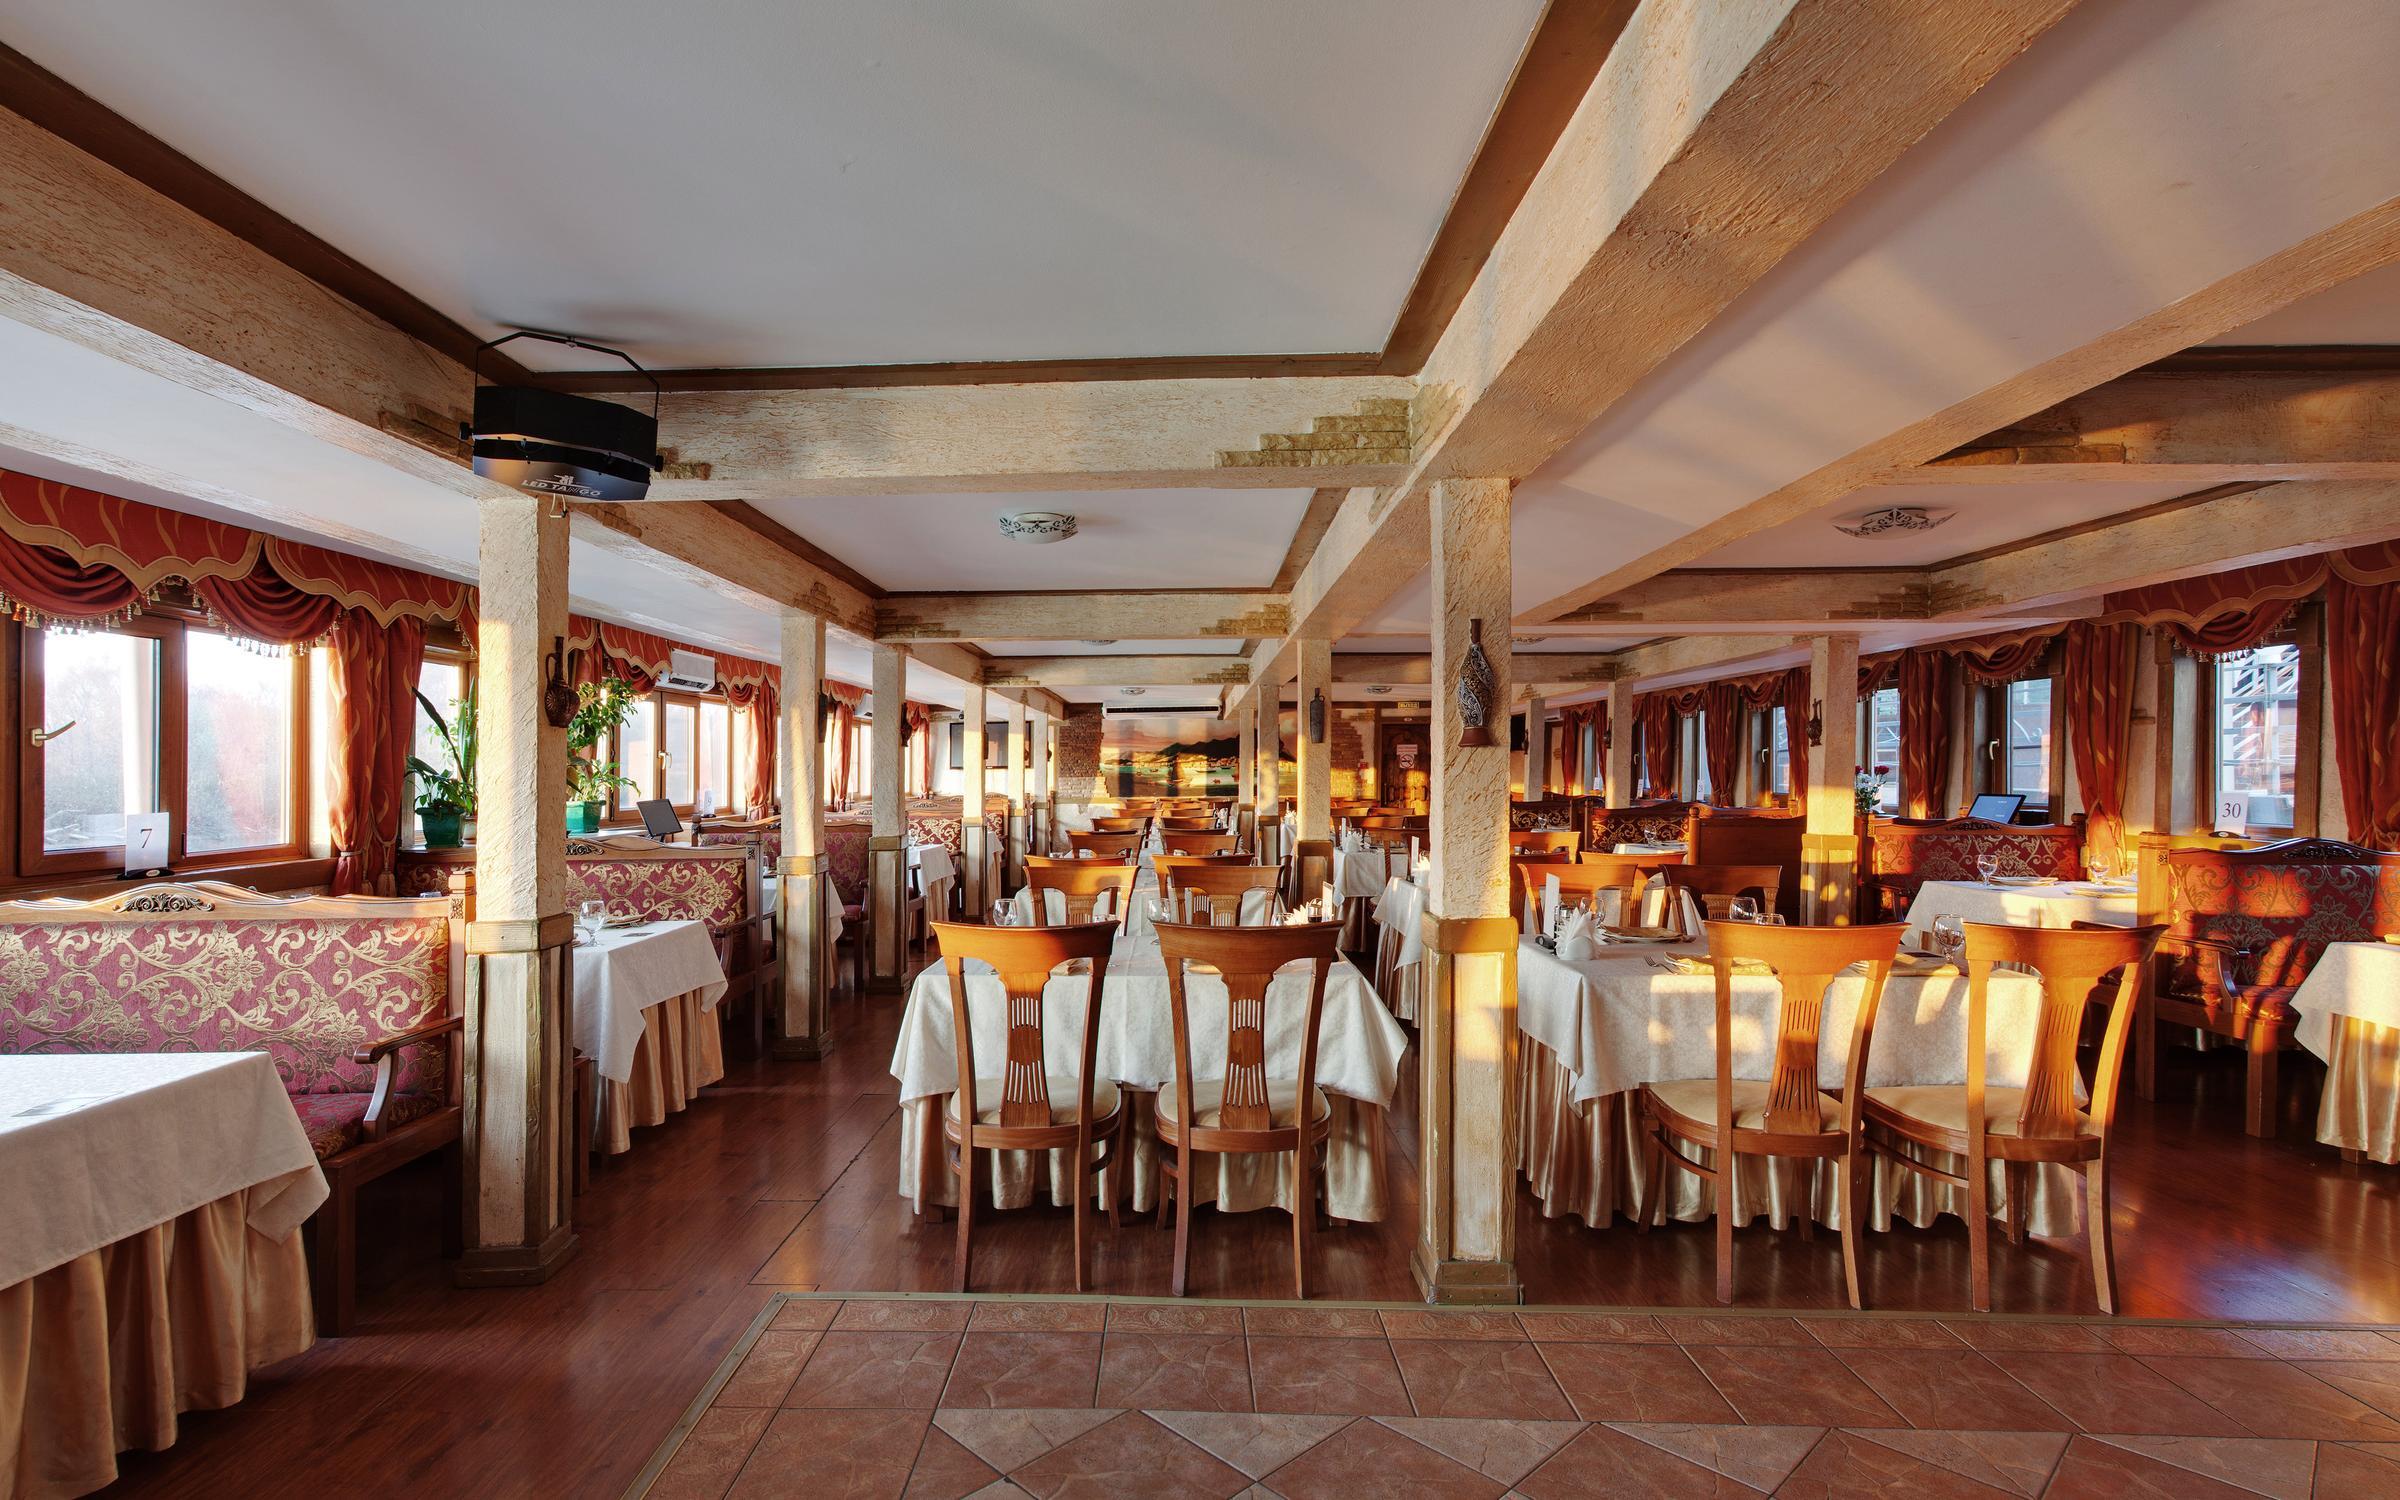 фотография Ресторана Бакинский Дворик